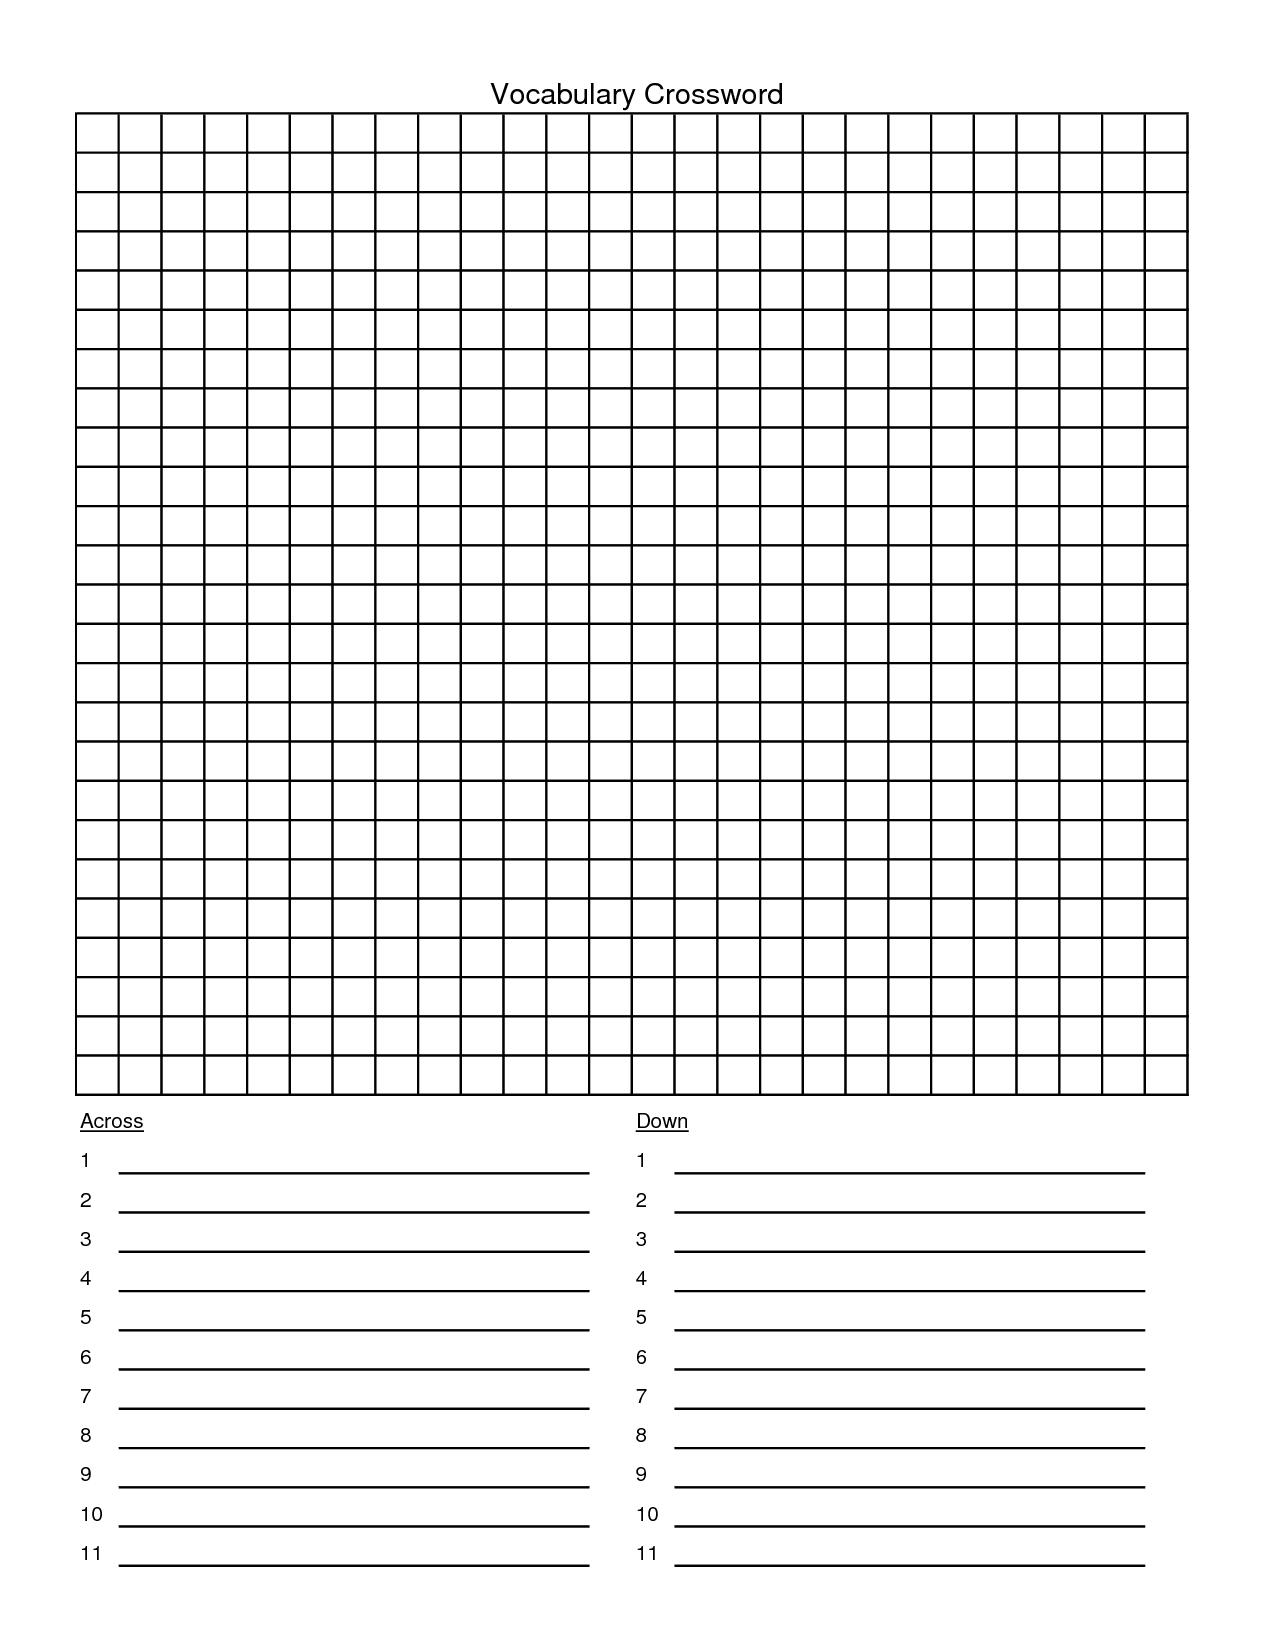 Crossword Puzzle Template - Yapis.sticken.co - Printable Crossword Puzzle Template